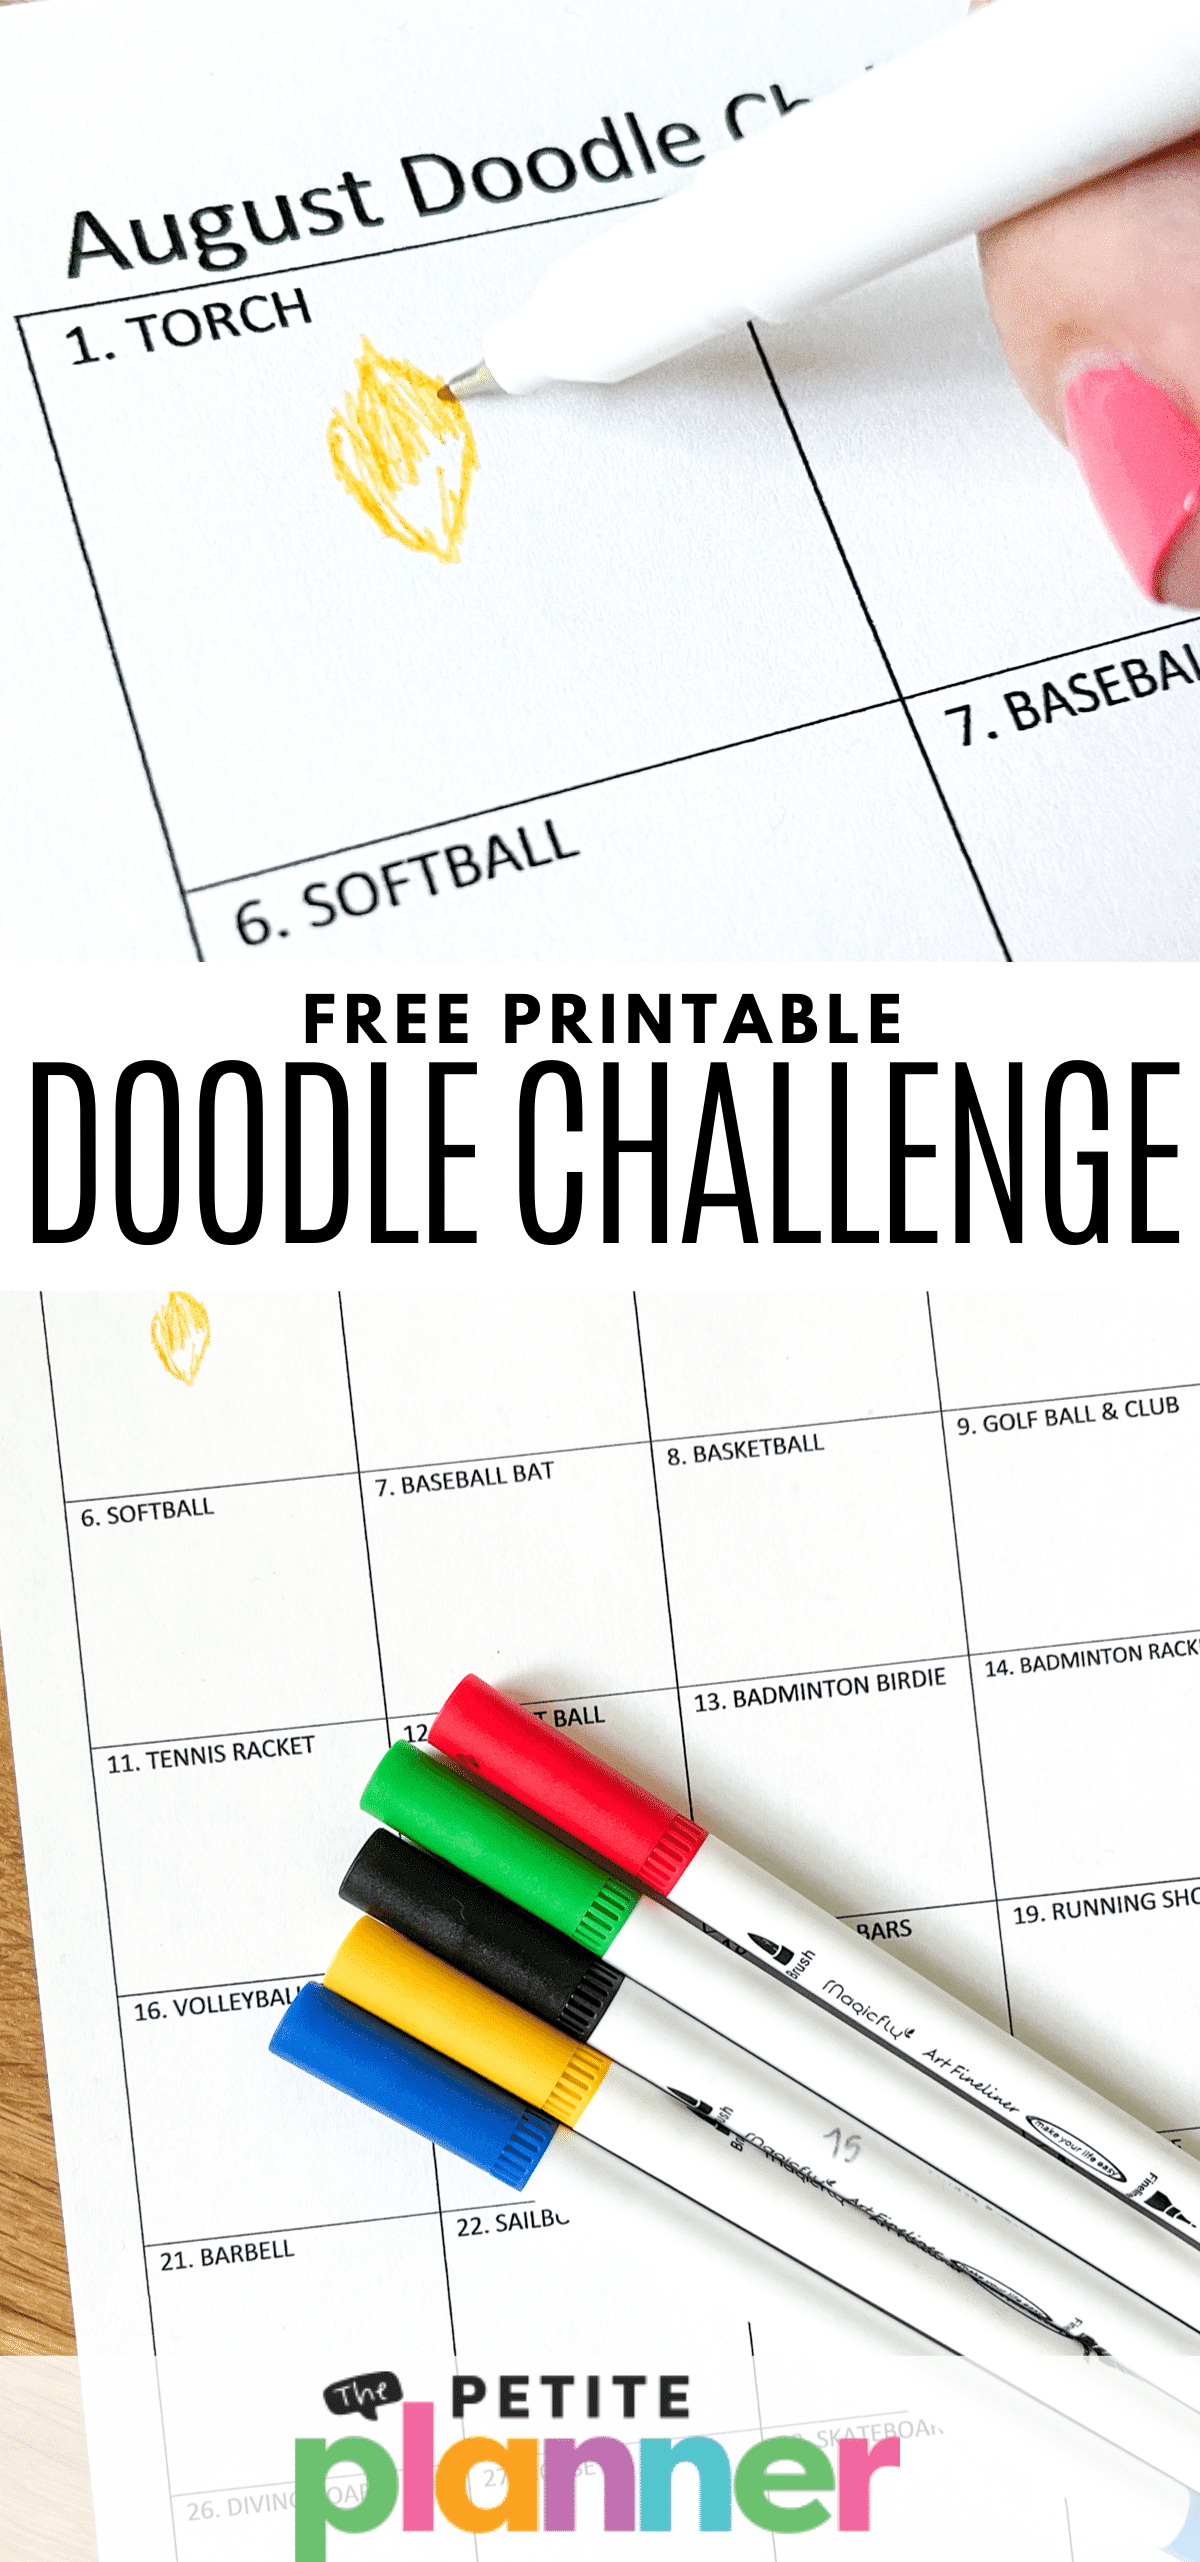 Printable Doodle Challenge Prompts